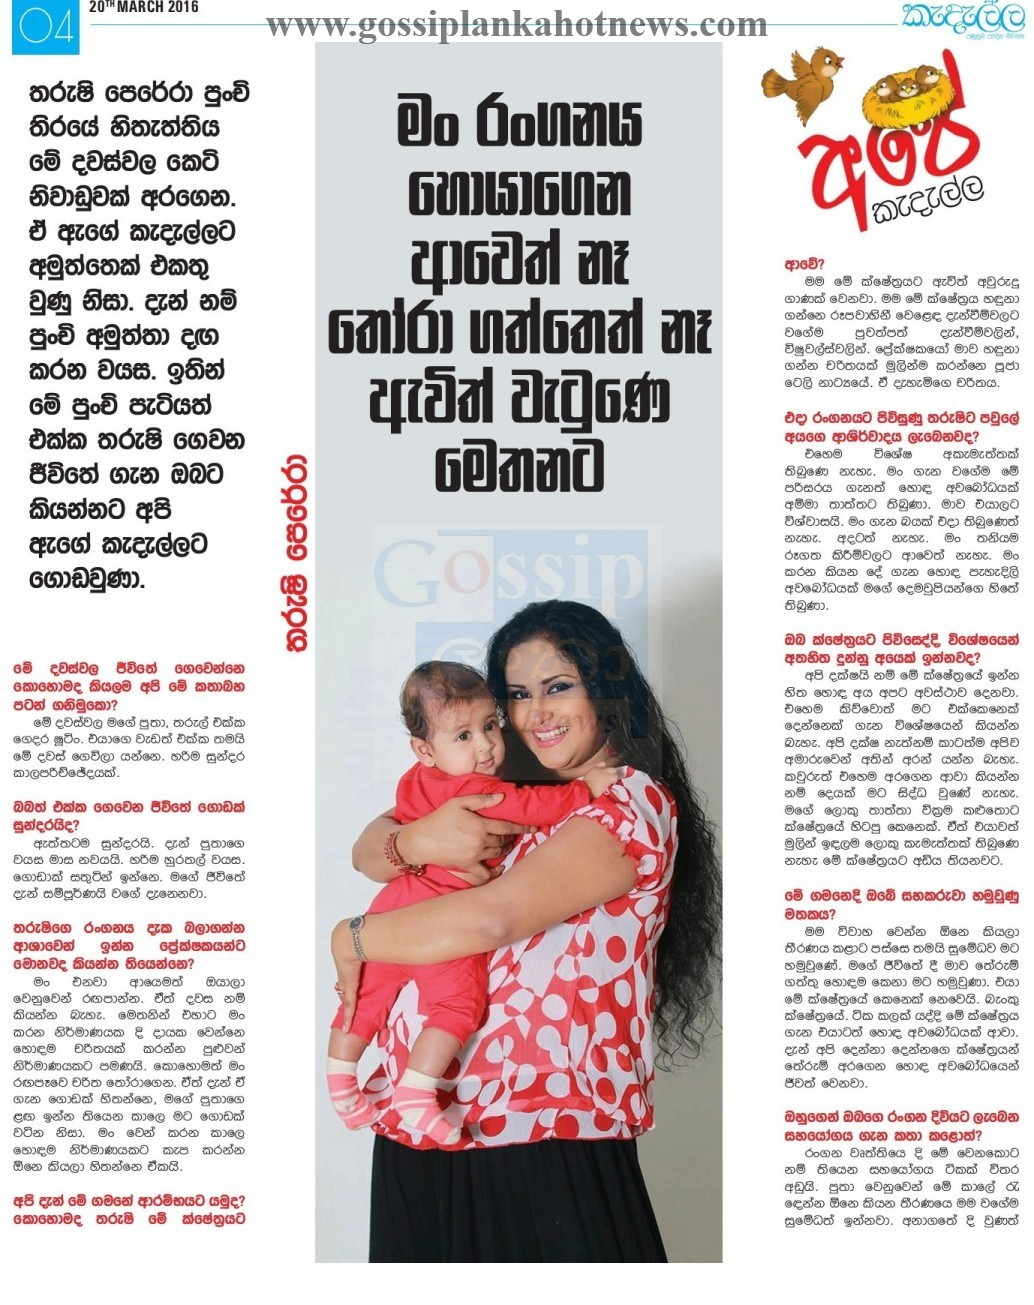 Gossip Lanka Chat with Tharushi Perera | Gossip Lanka